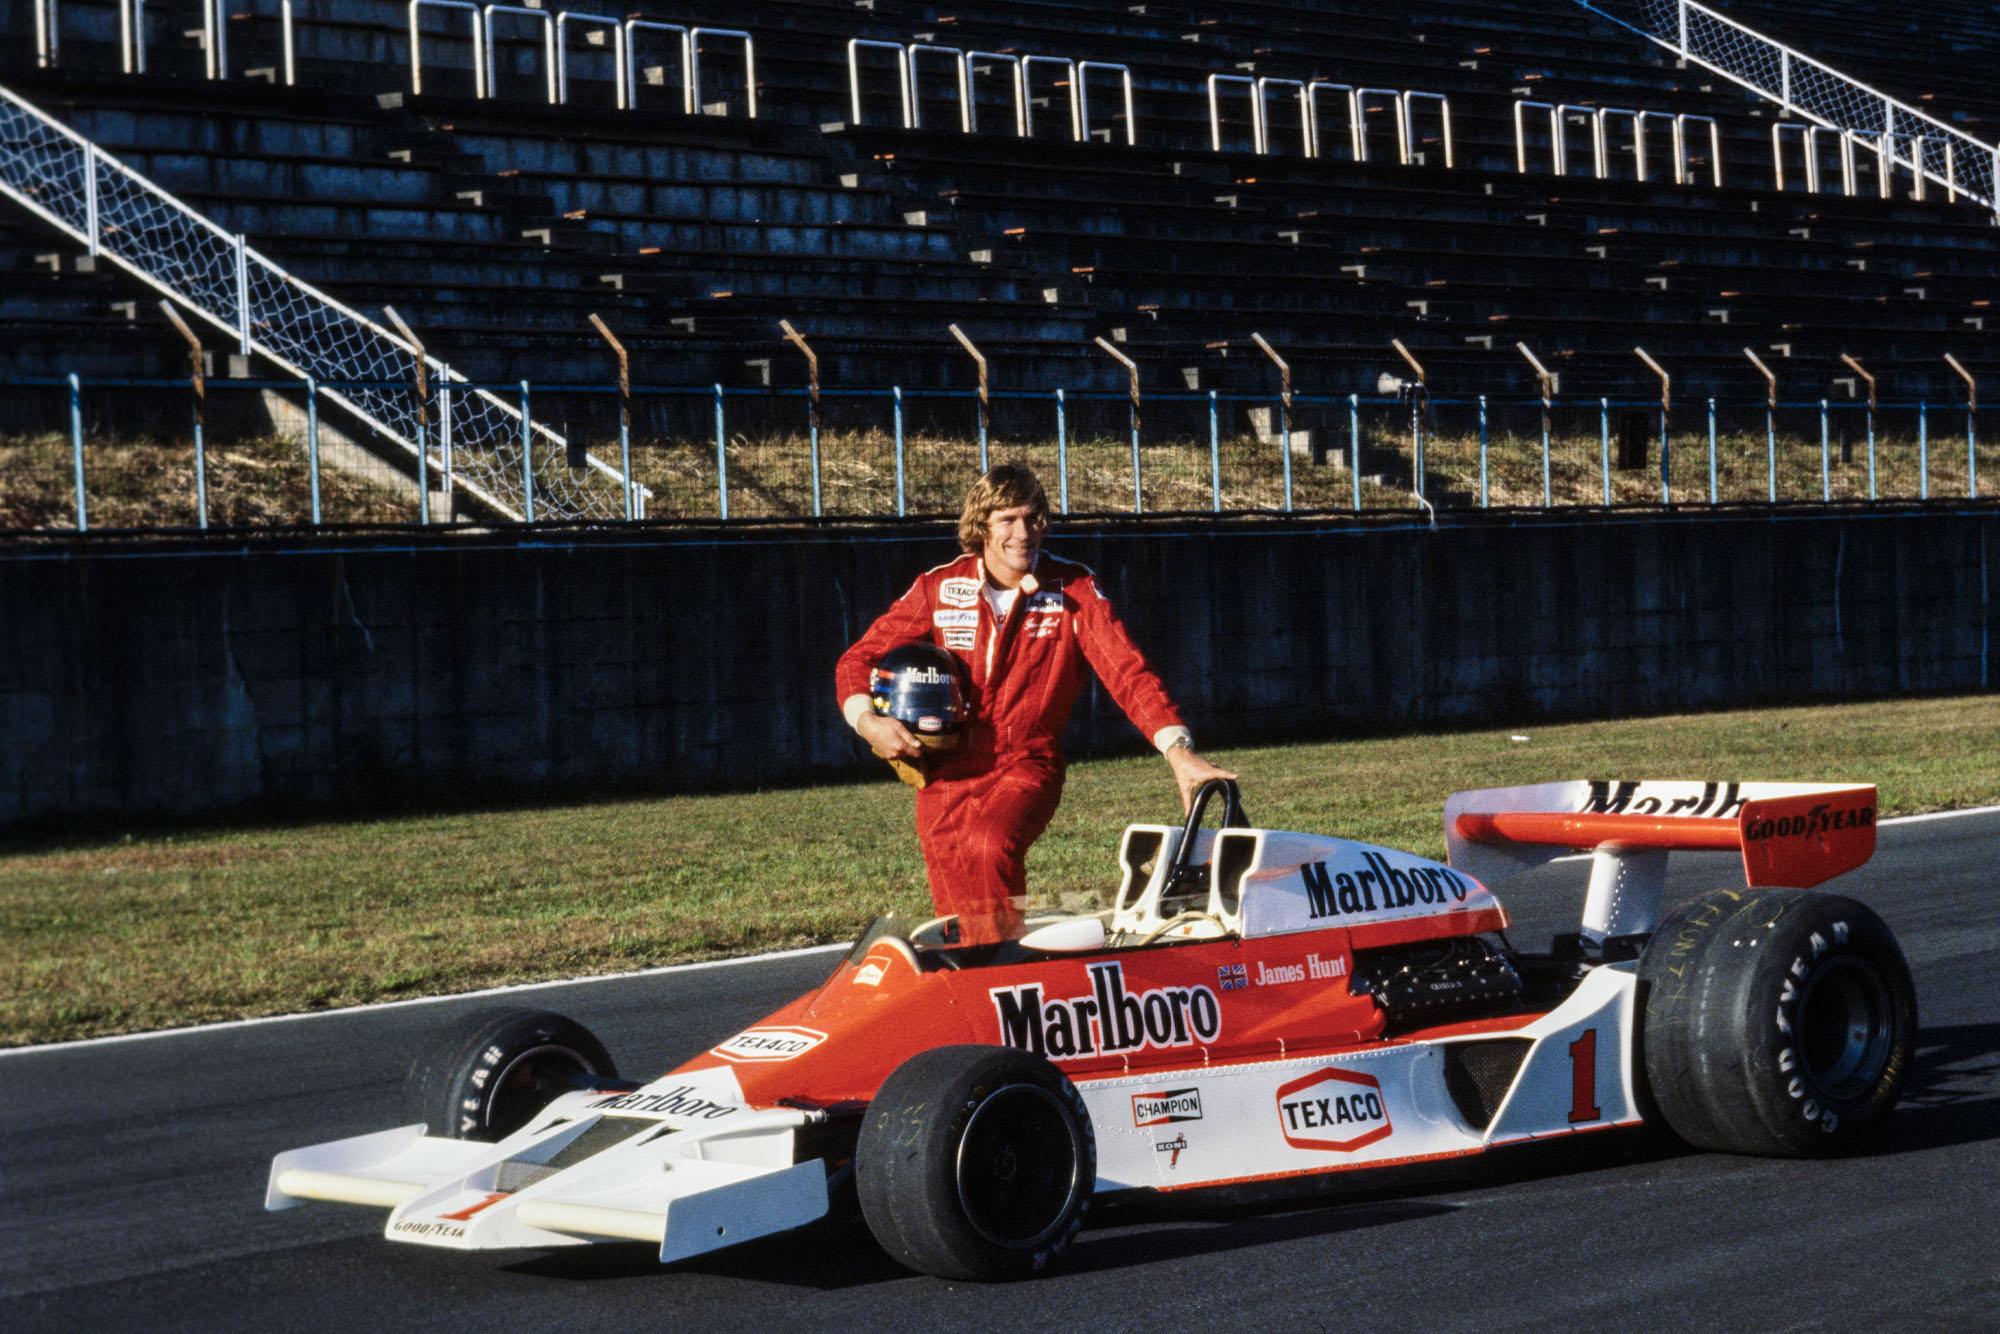 James Hunt poses with his McLaren at the 1977 Japanese Grand Prix, Fuji.